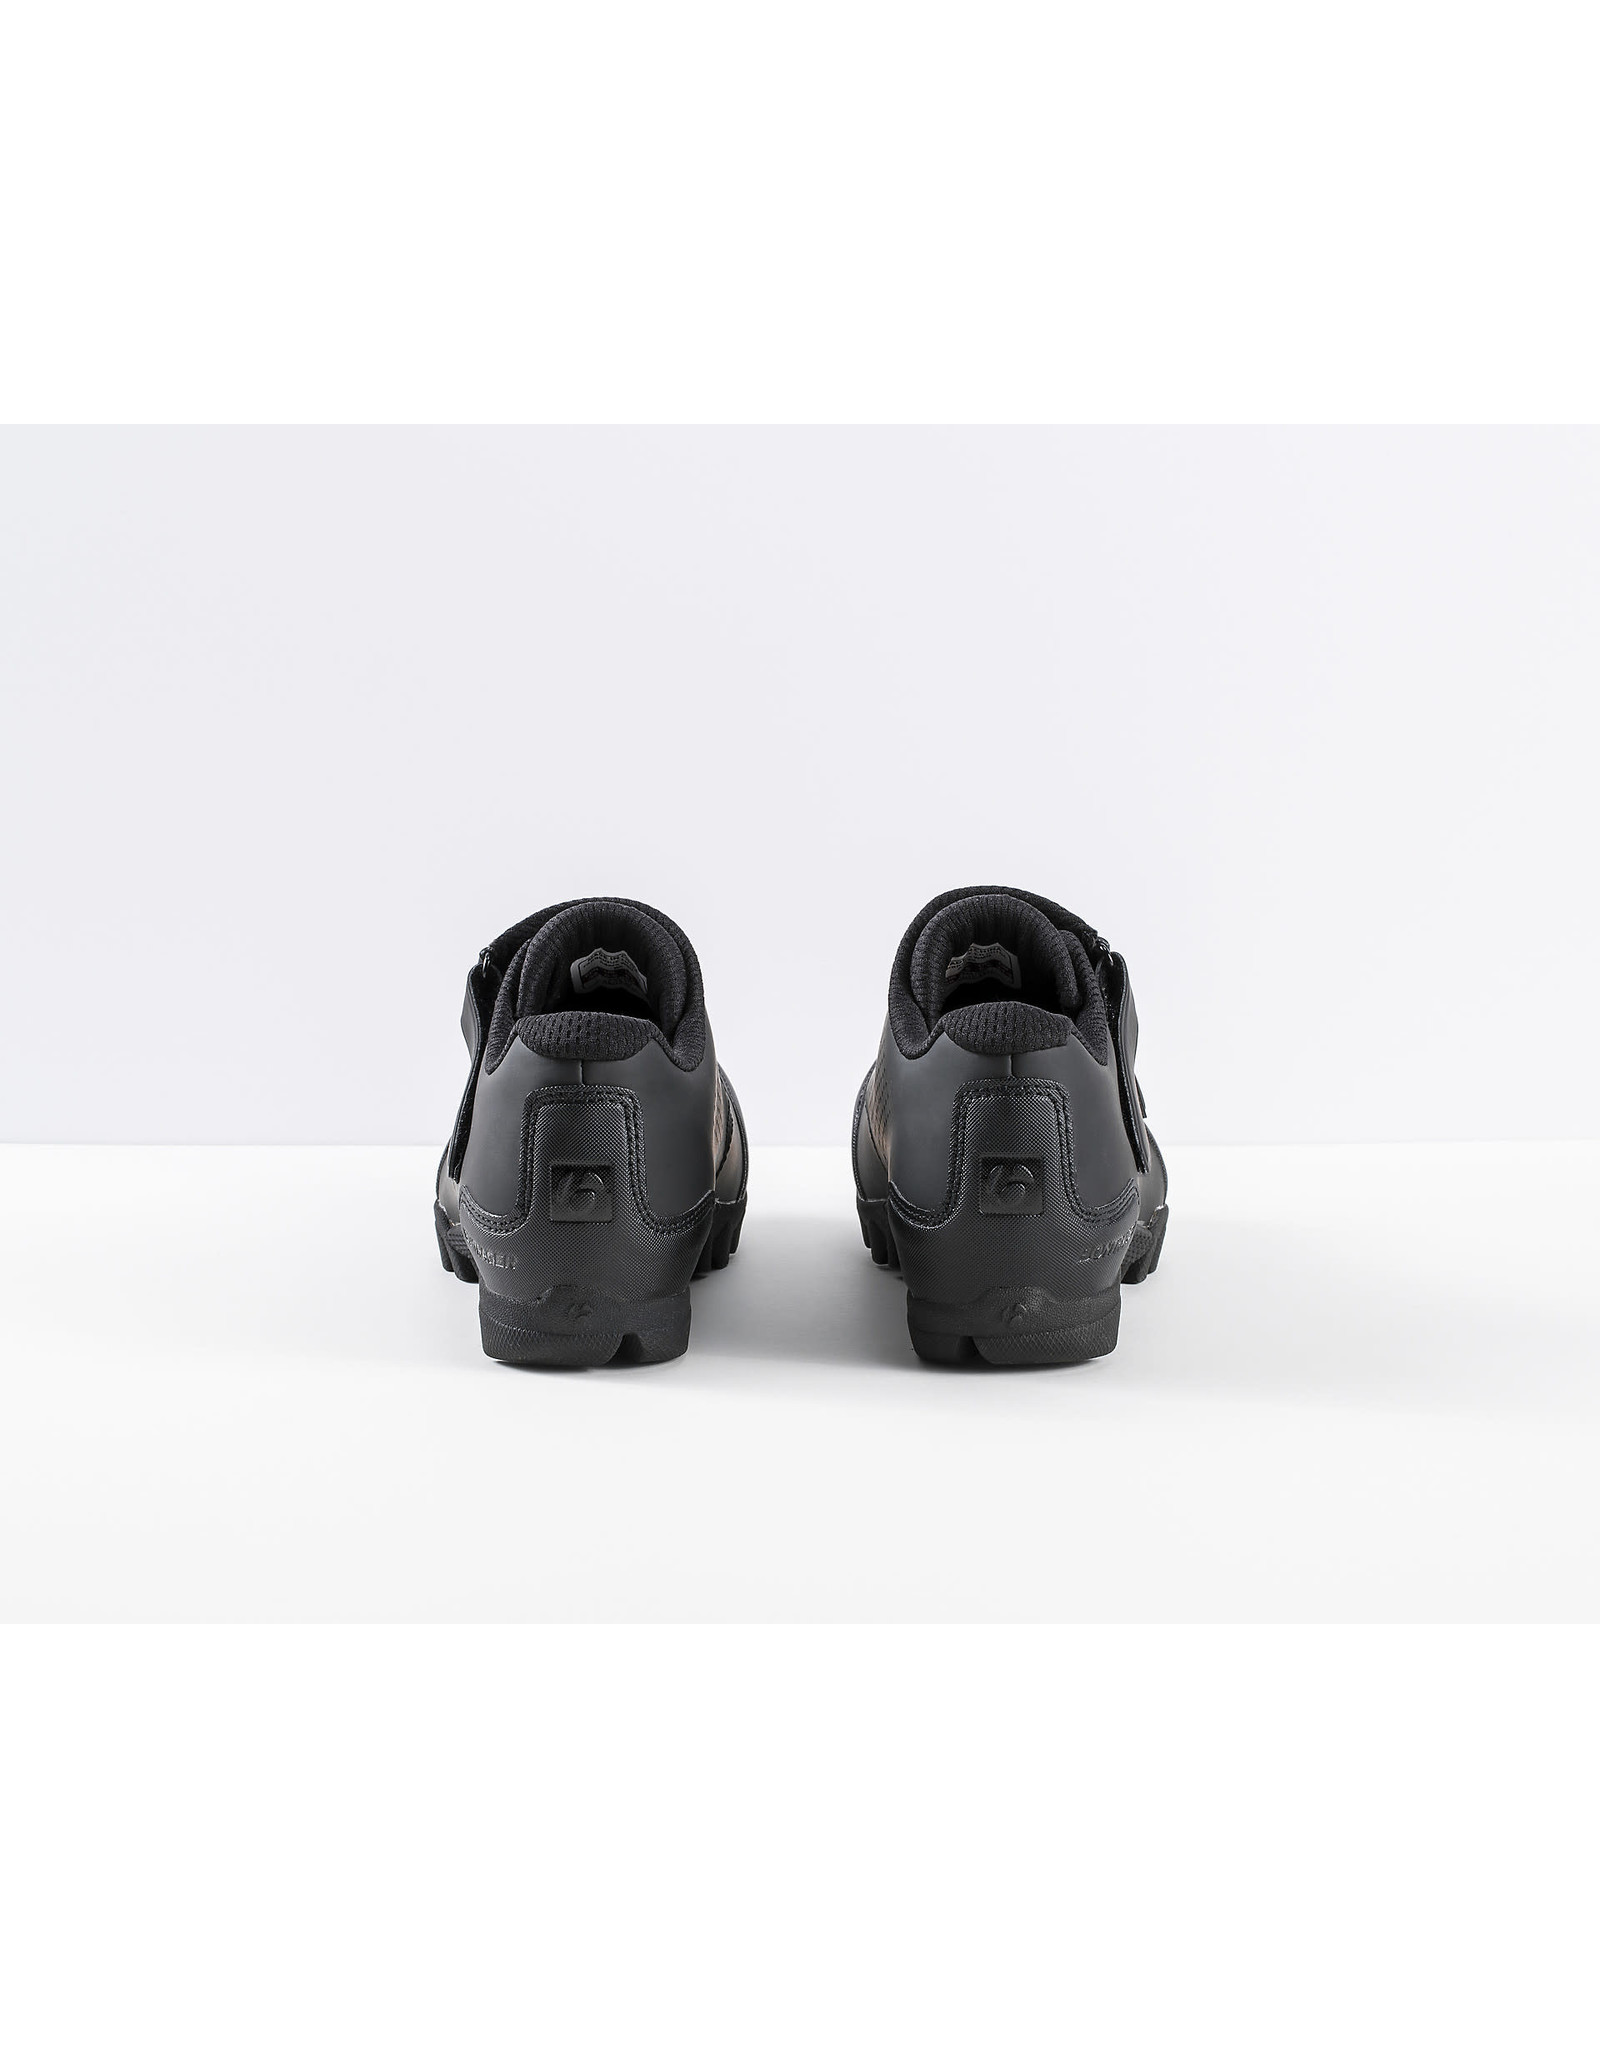 Bontrager Chaussures de VTT Bontrager Adorn pour femmes